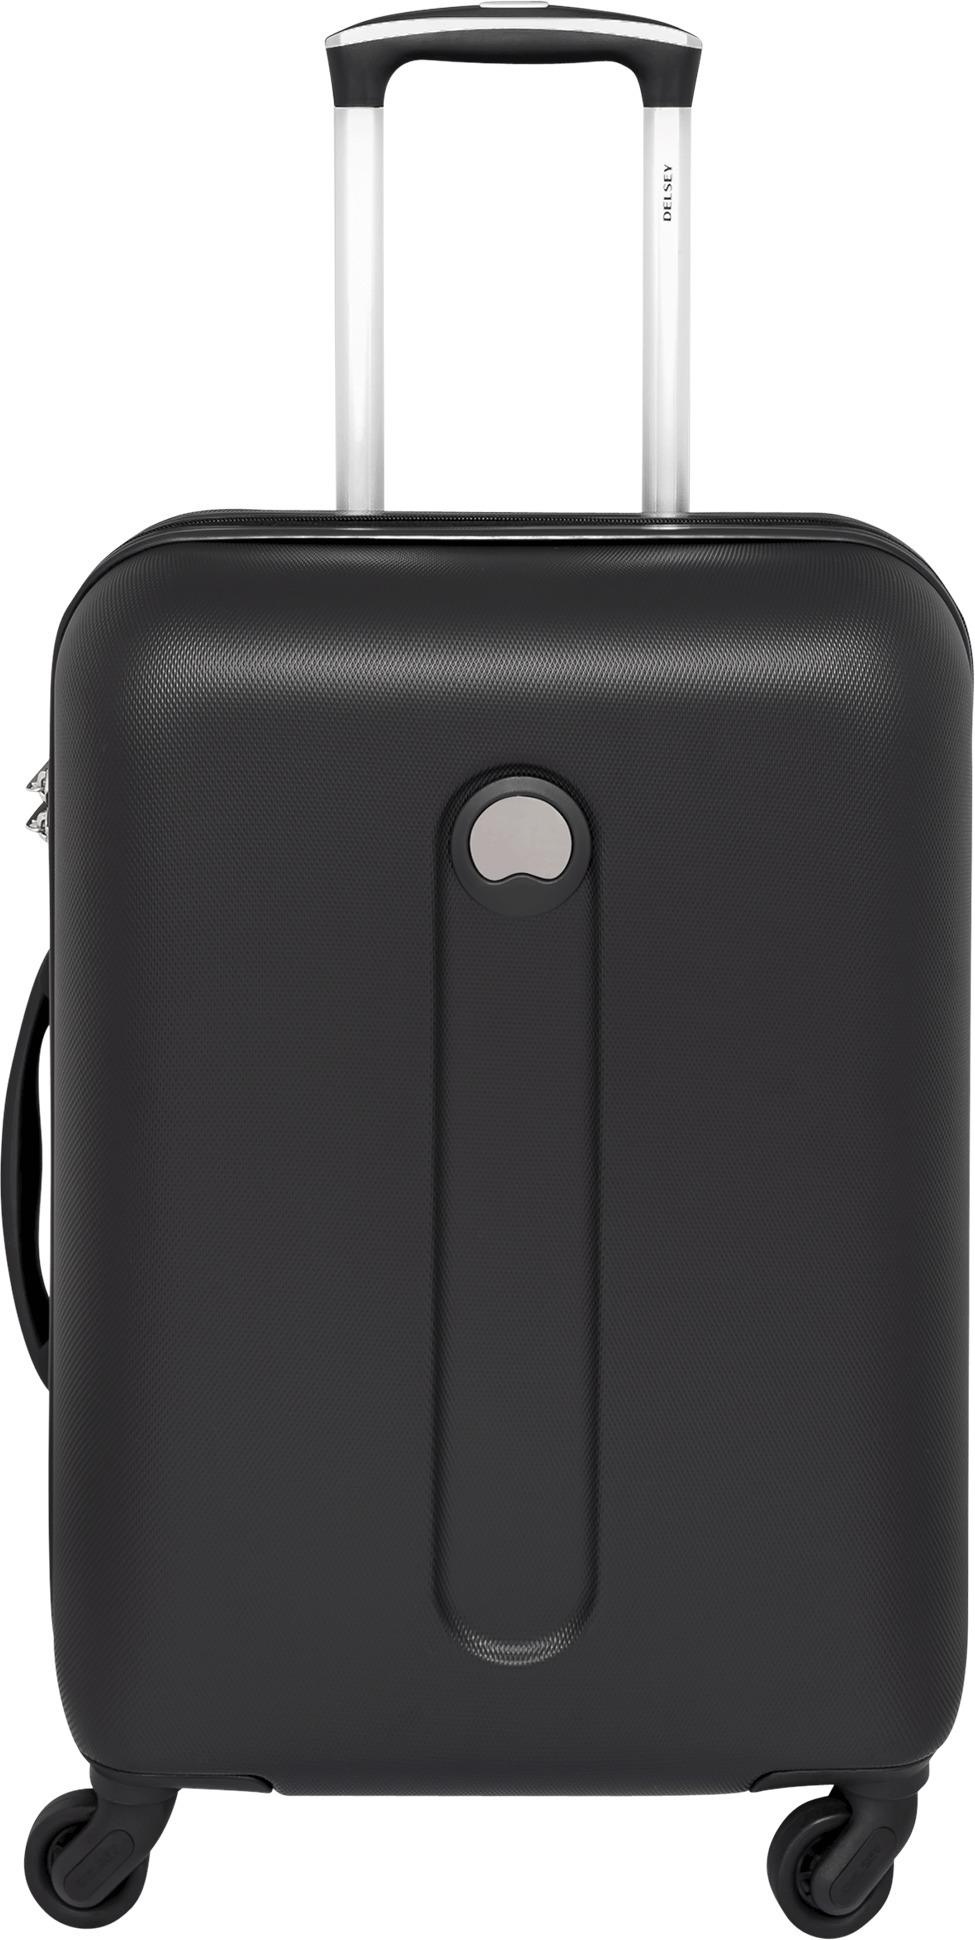 Чемодан Delsey Helium Classic 55 см черный